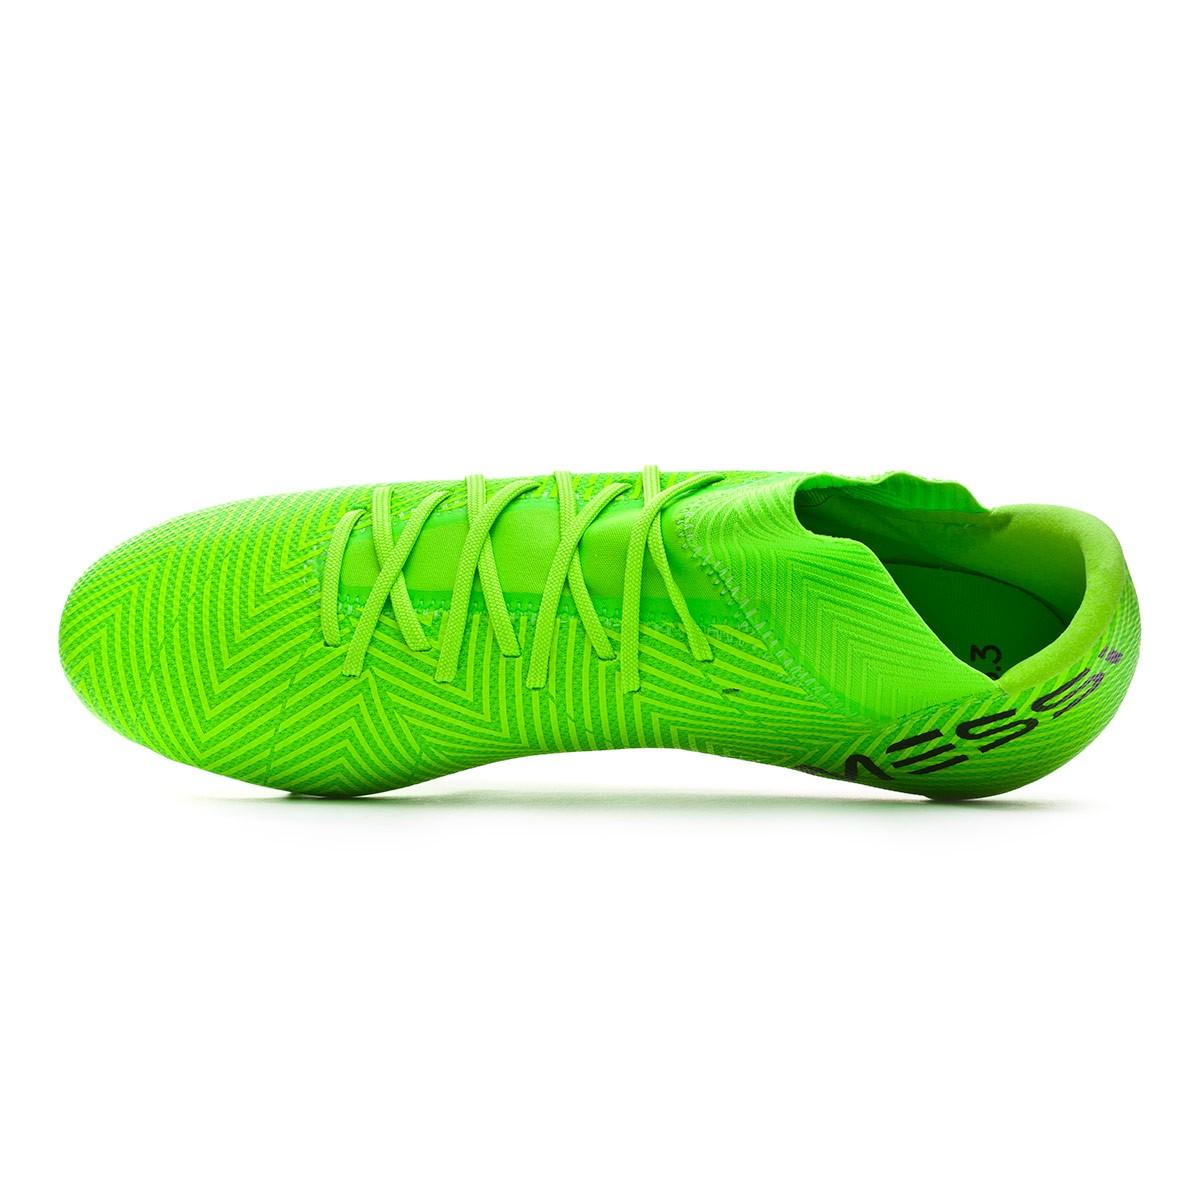 half off 1ce6c 5a891 Football Boots adidas Nemeziz Messi 18.3 FG Solar green-Black - Tienda de  fútbol Fútbol Emotion